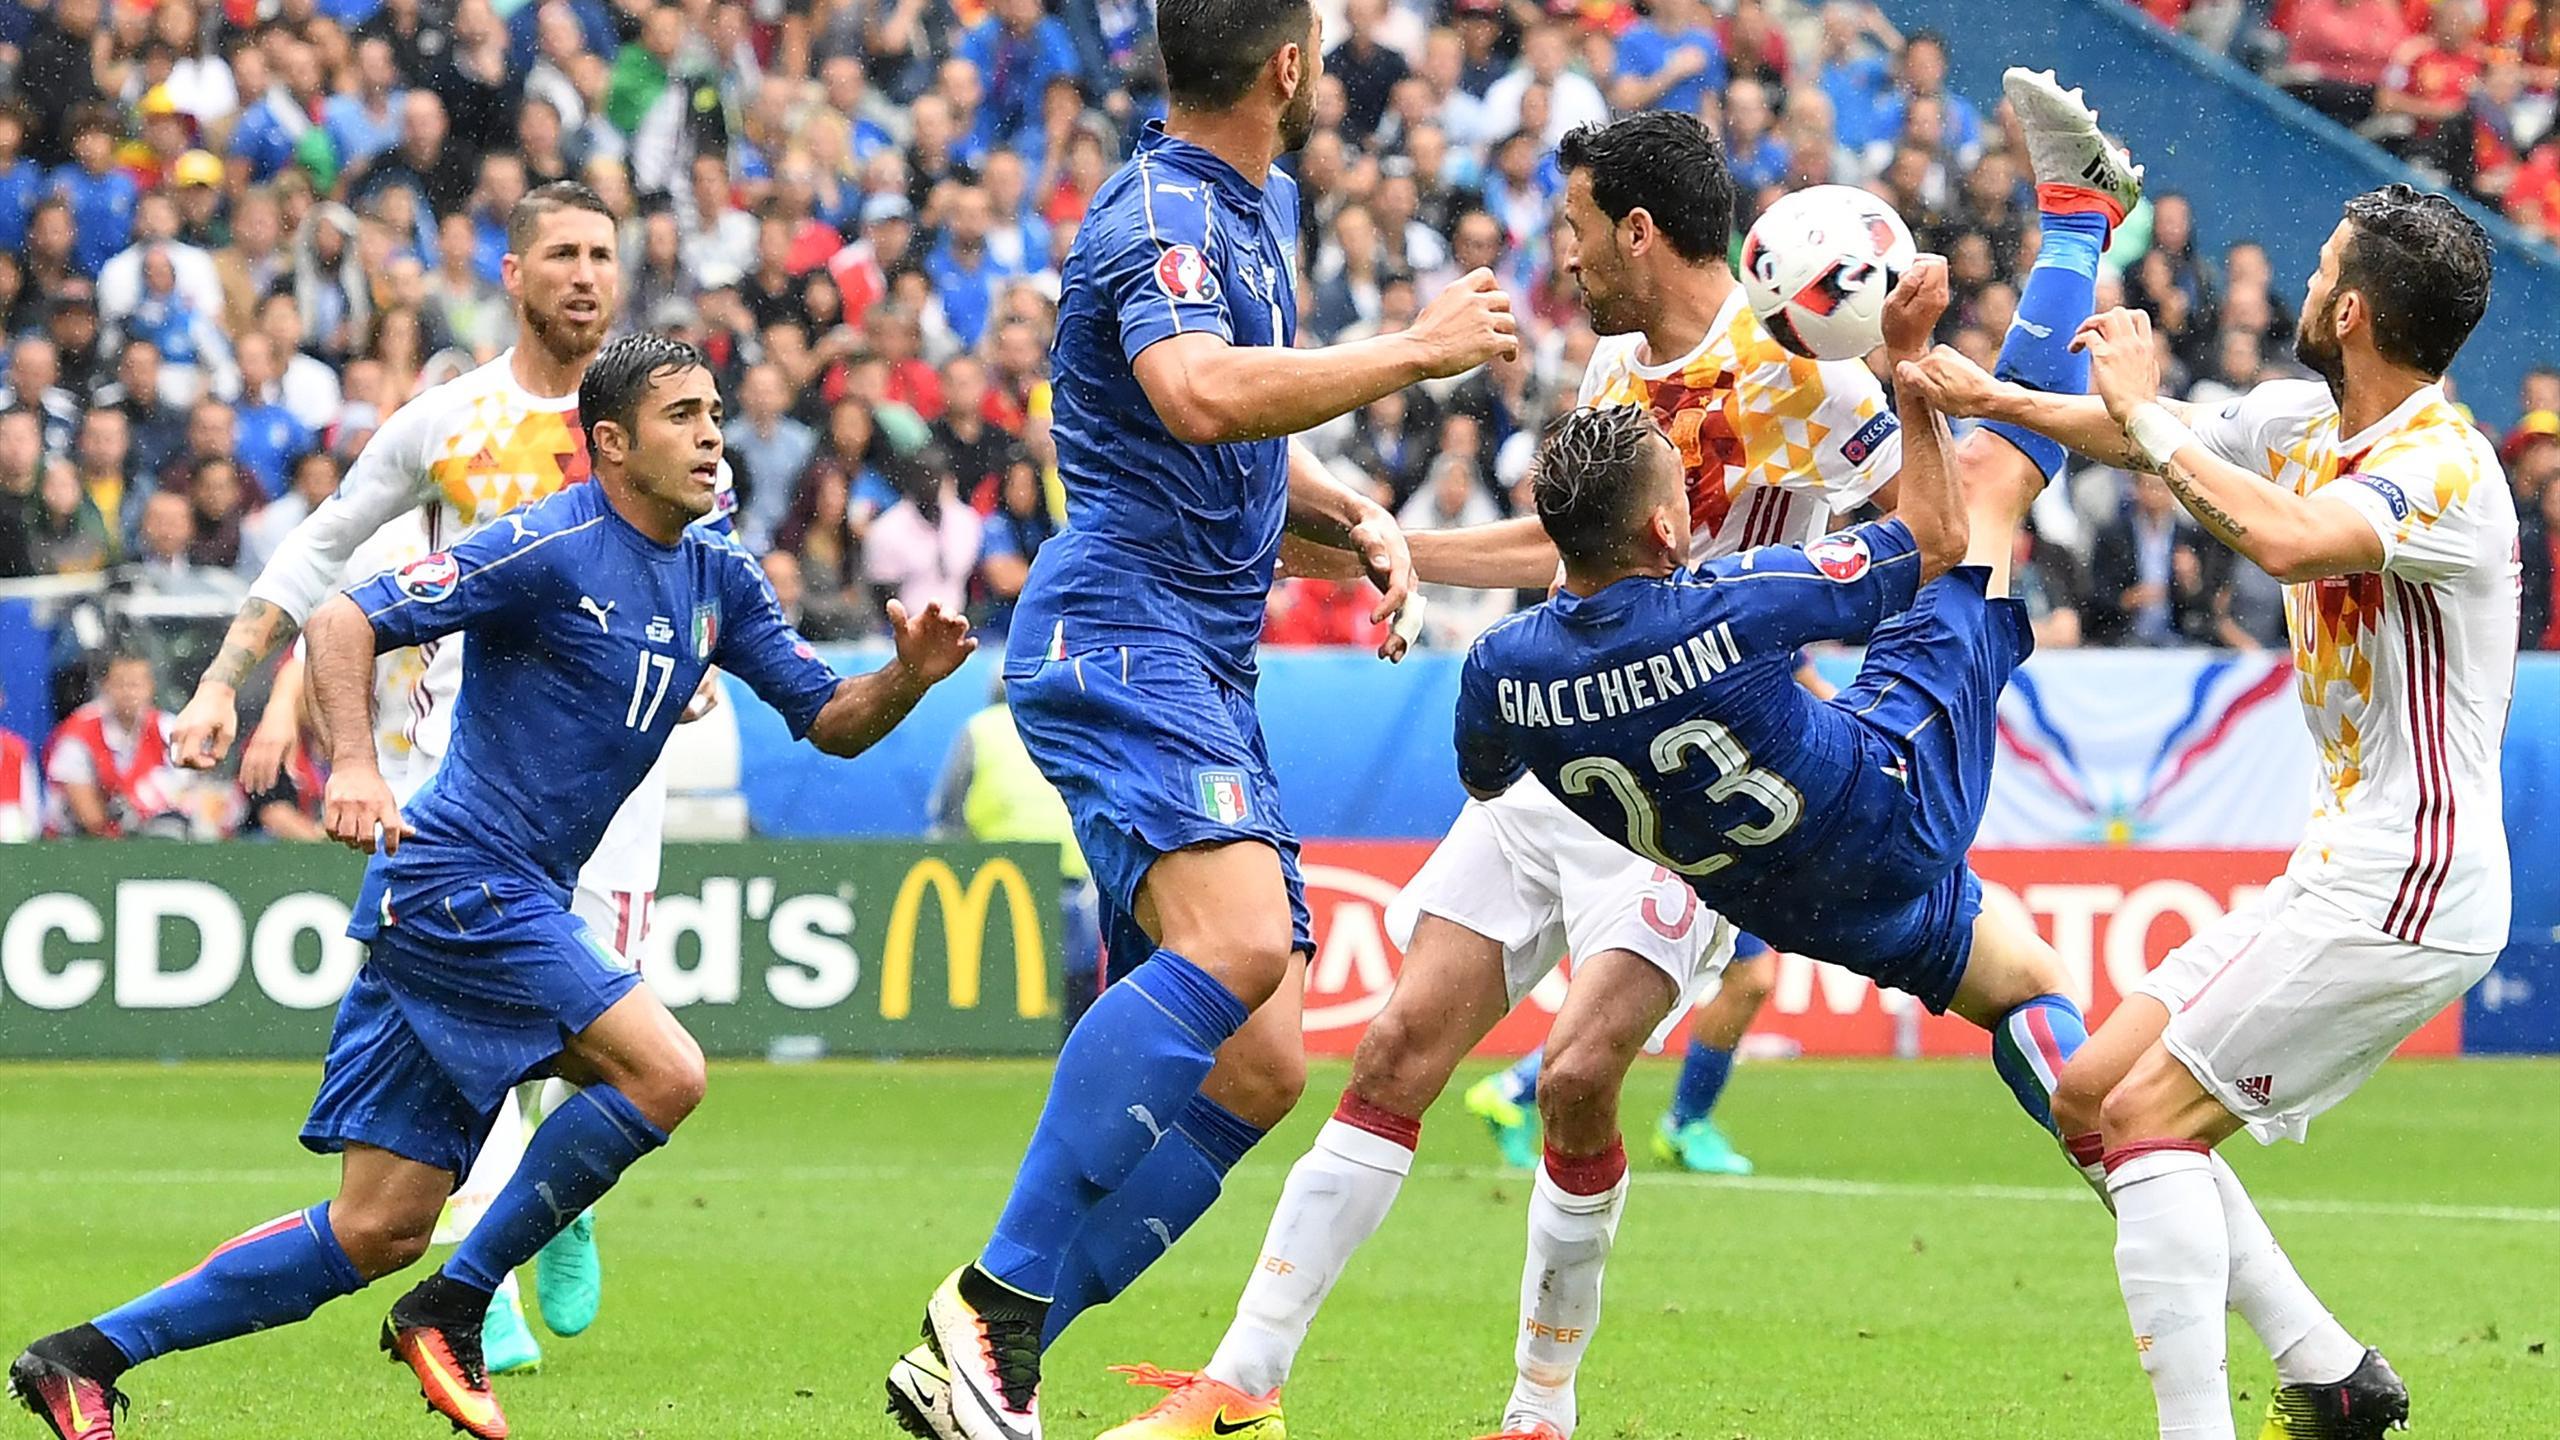 Emanuele Giaccherini - Italy v Spain - Euro 2016